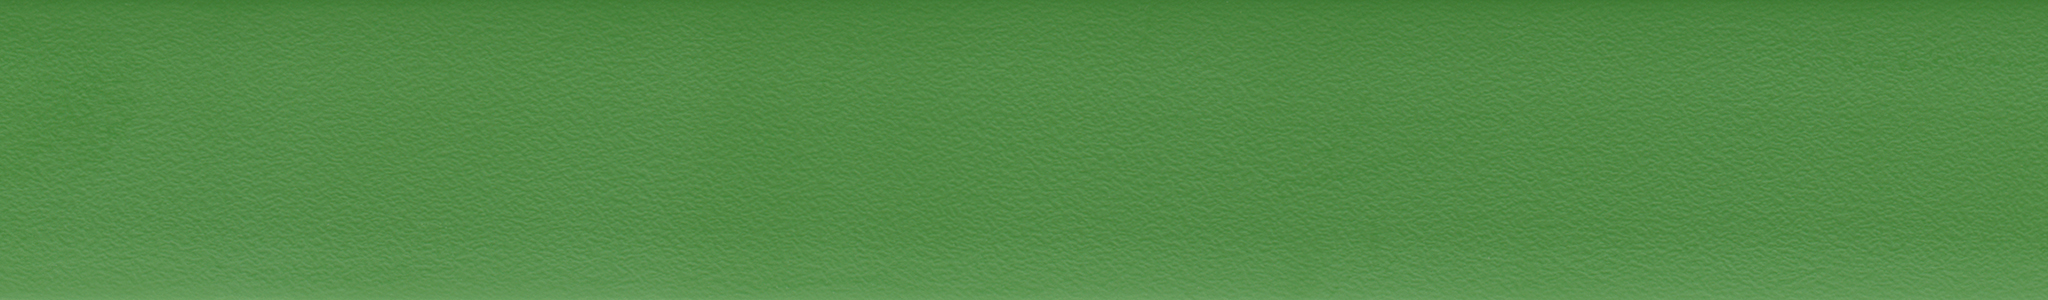 HU 16650 ABS hrana zelená perla XG